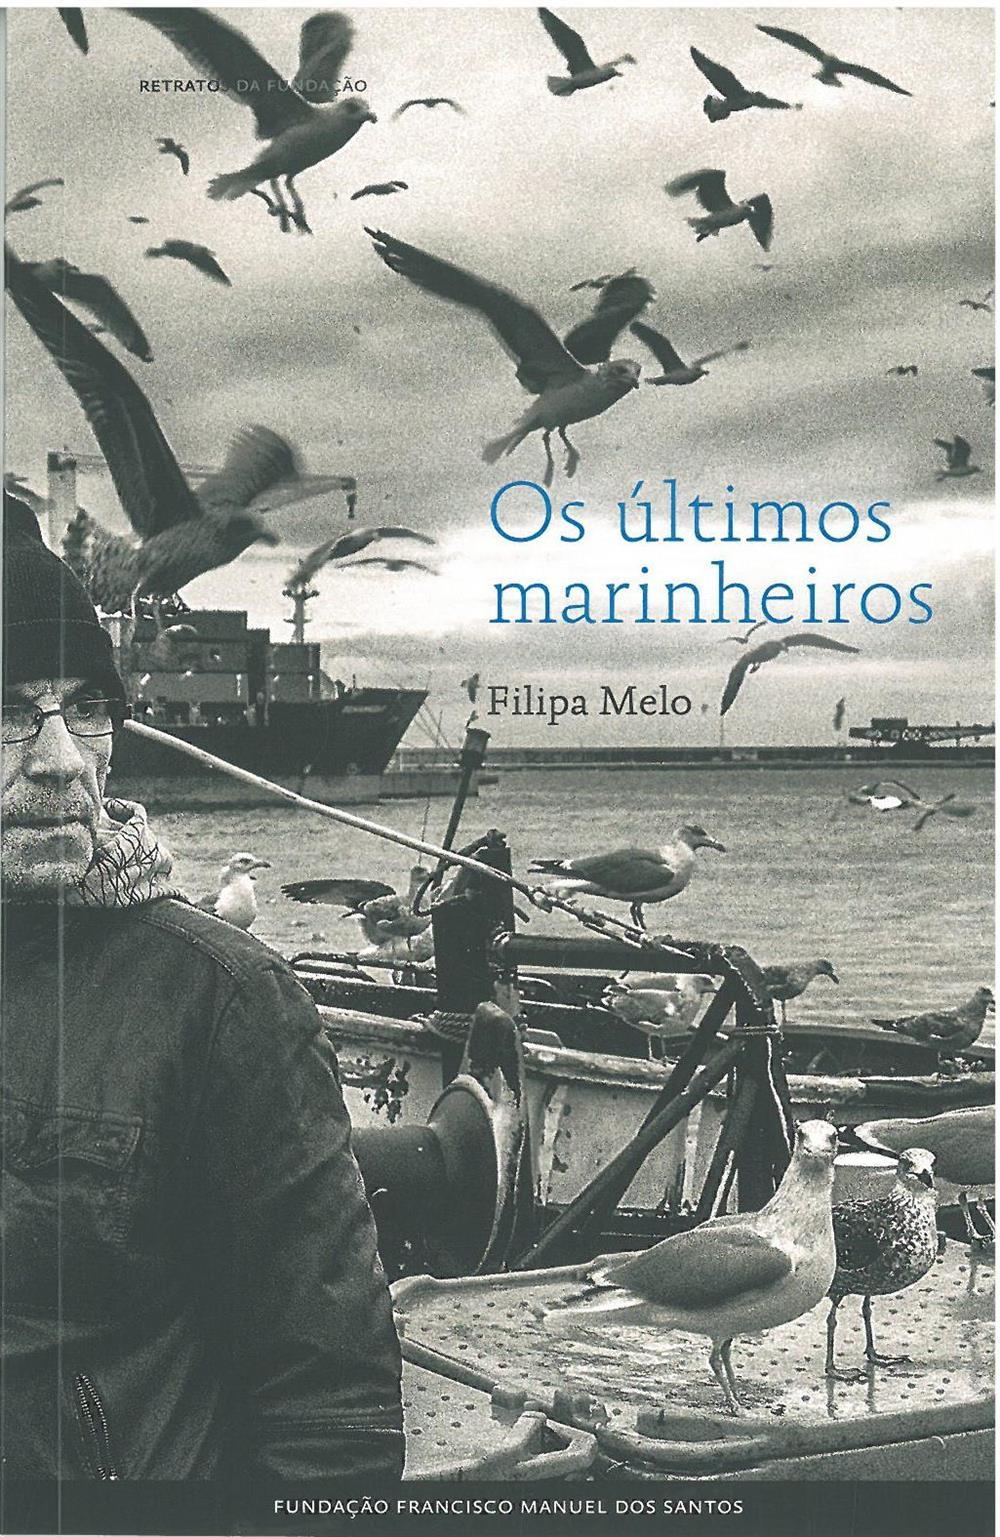 Os últimos marinheiros_.jpg